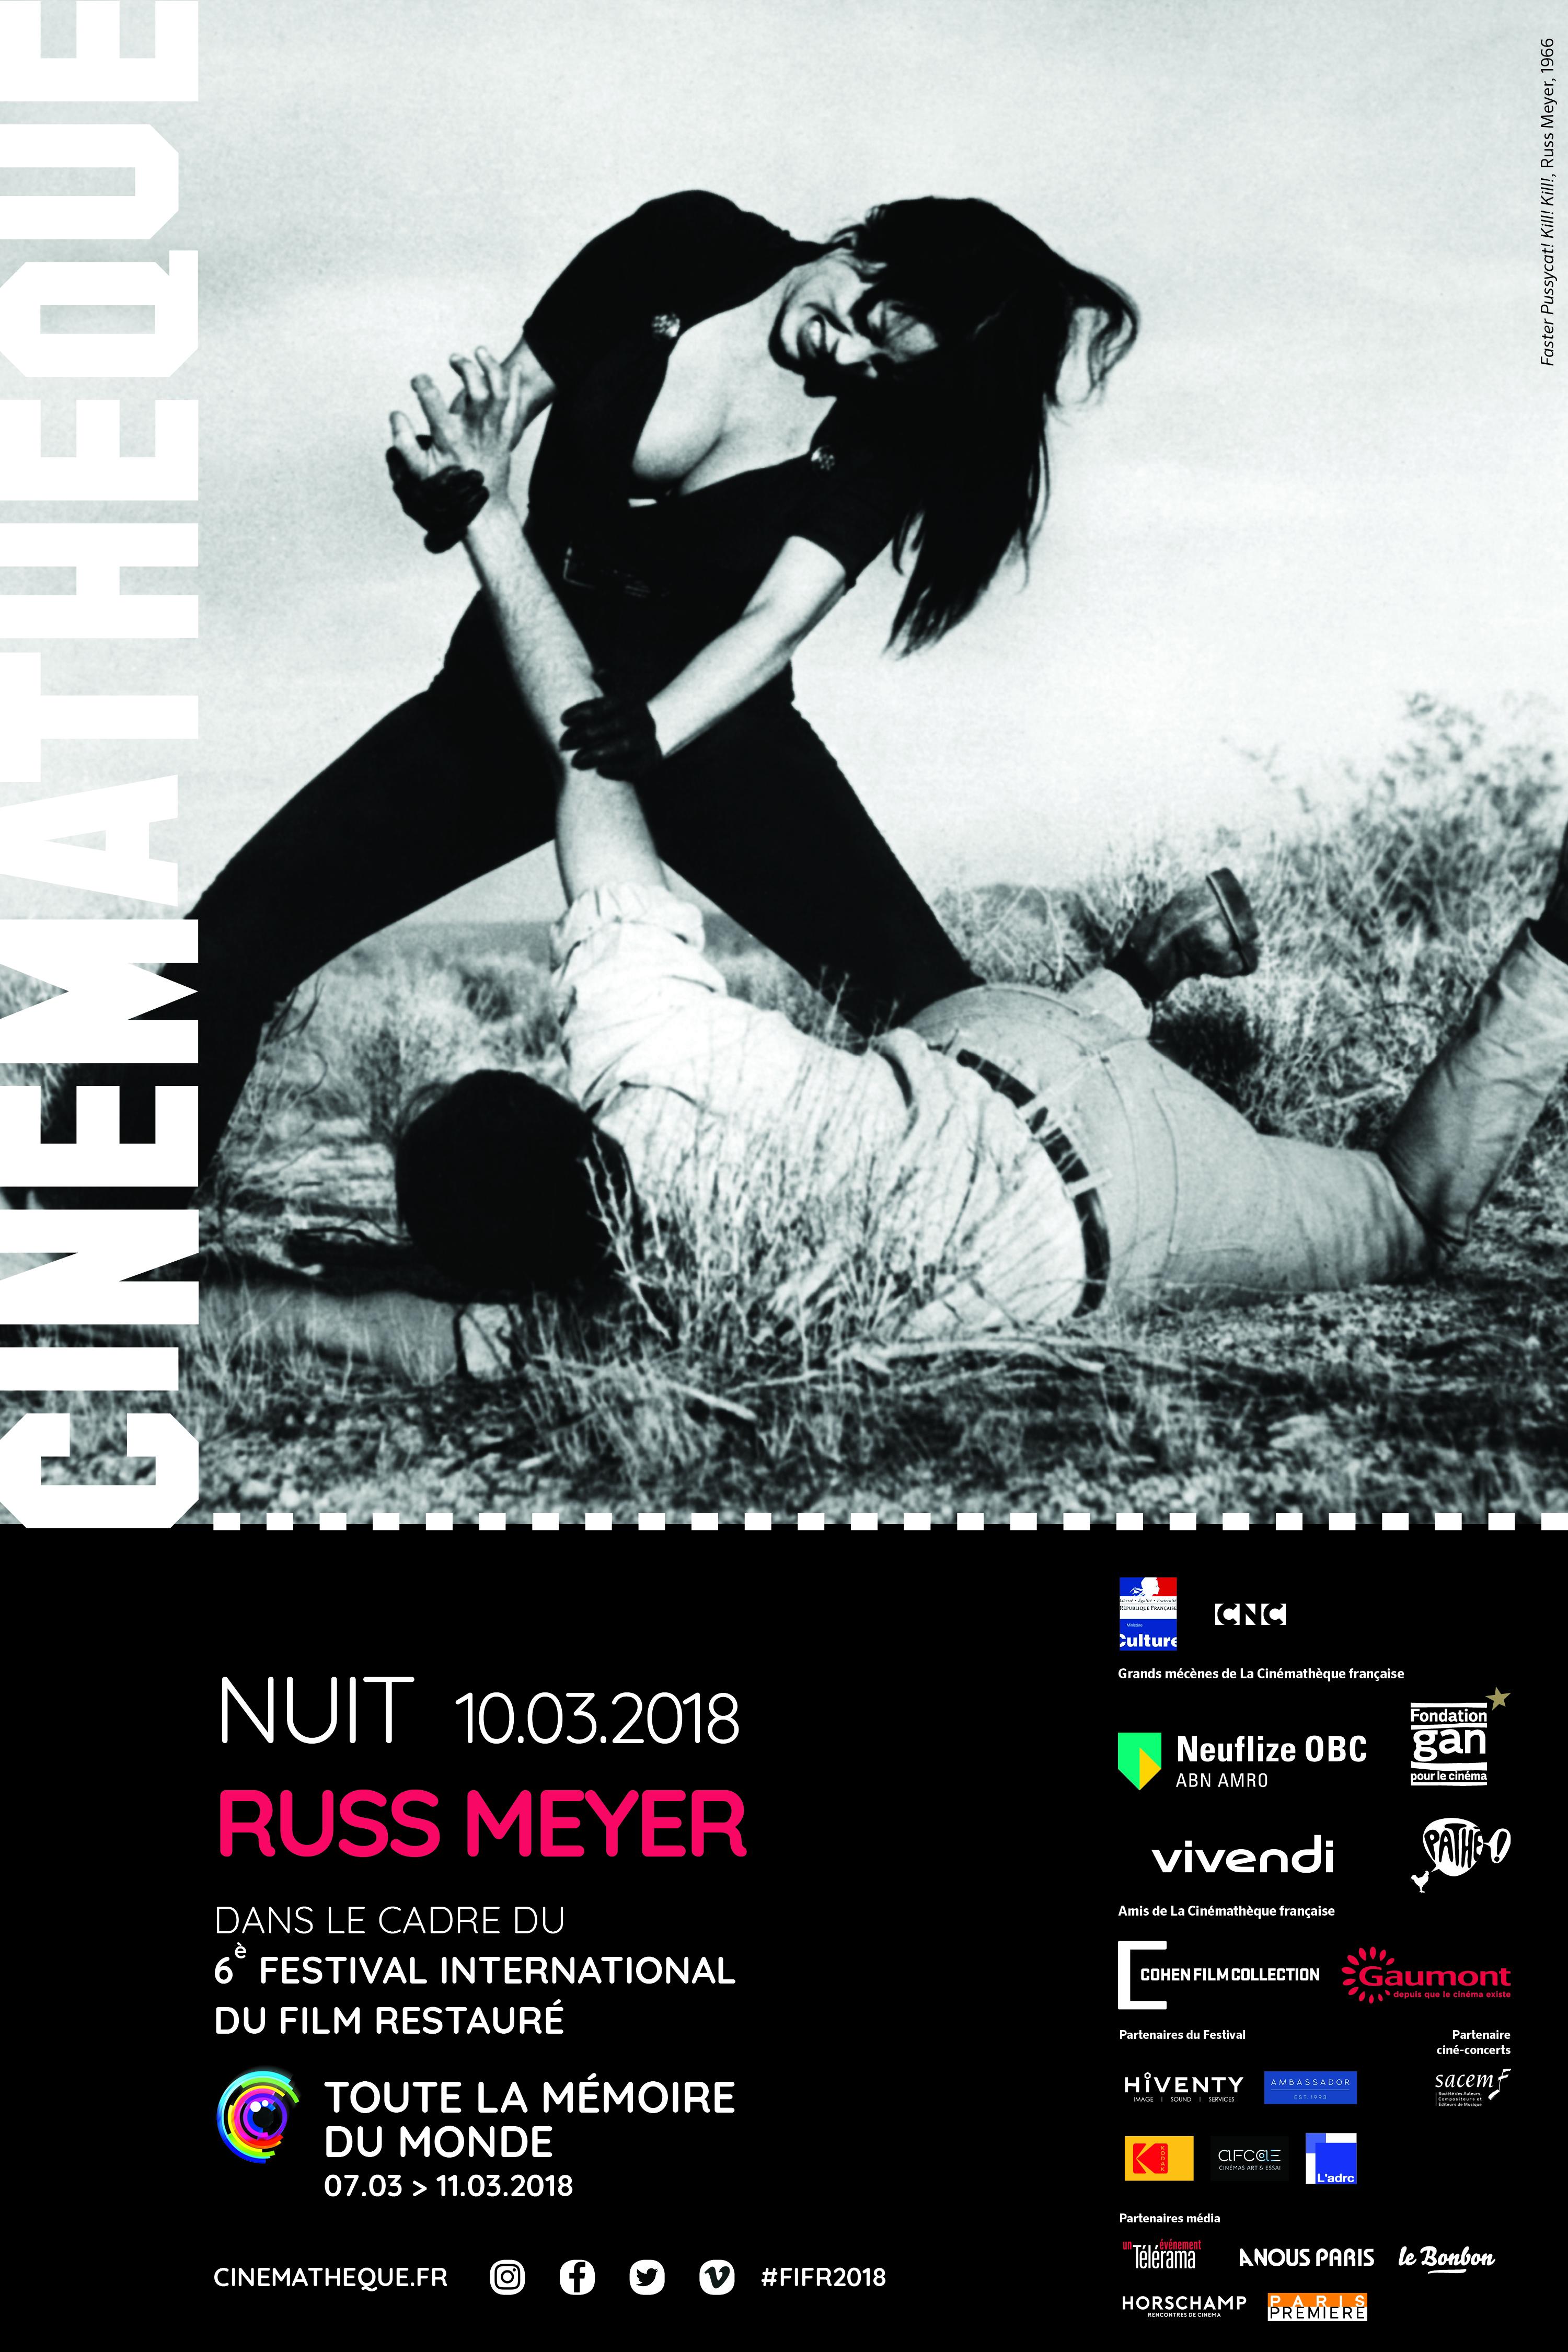 nuit russ Meyer cinematheque